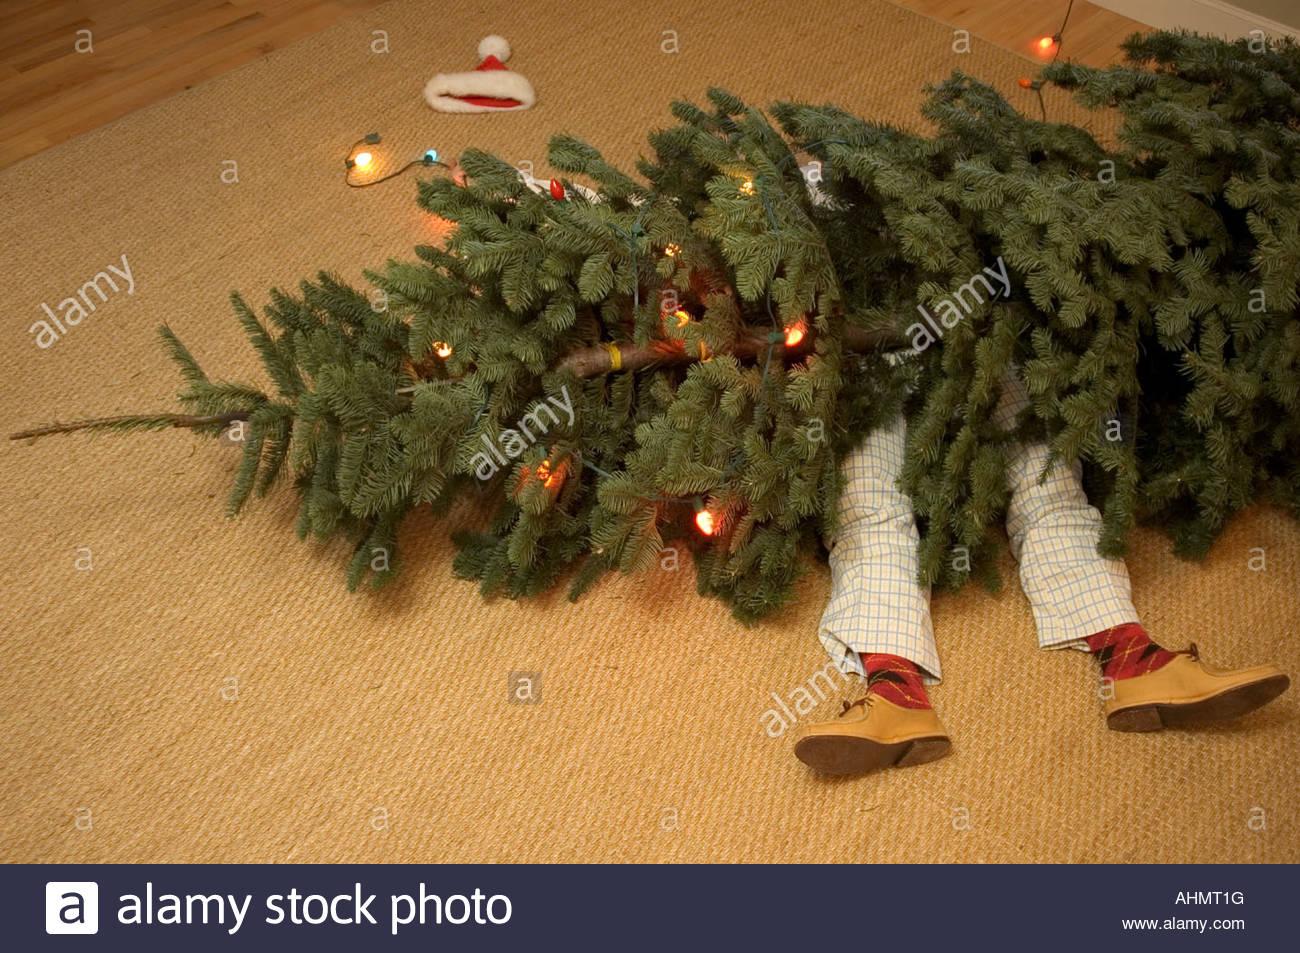 Man stuck underneath fallen Christmas tree Stock Photo, Royalty ...